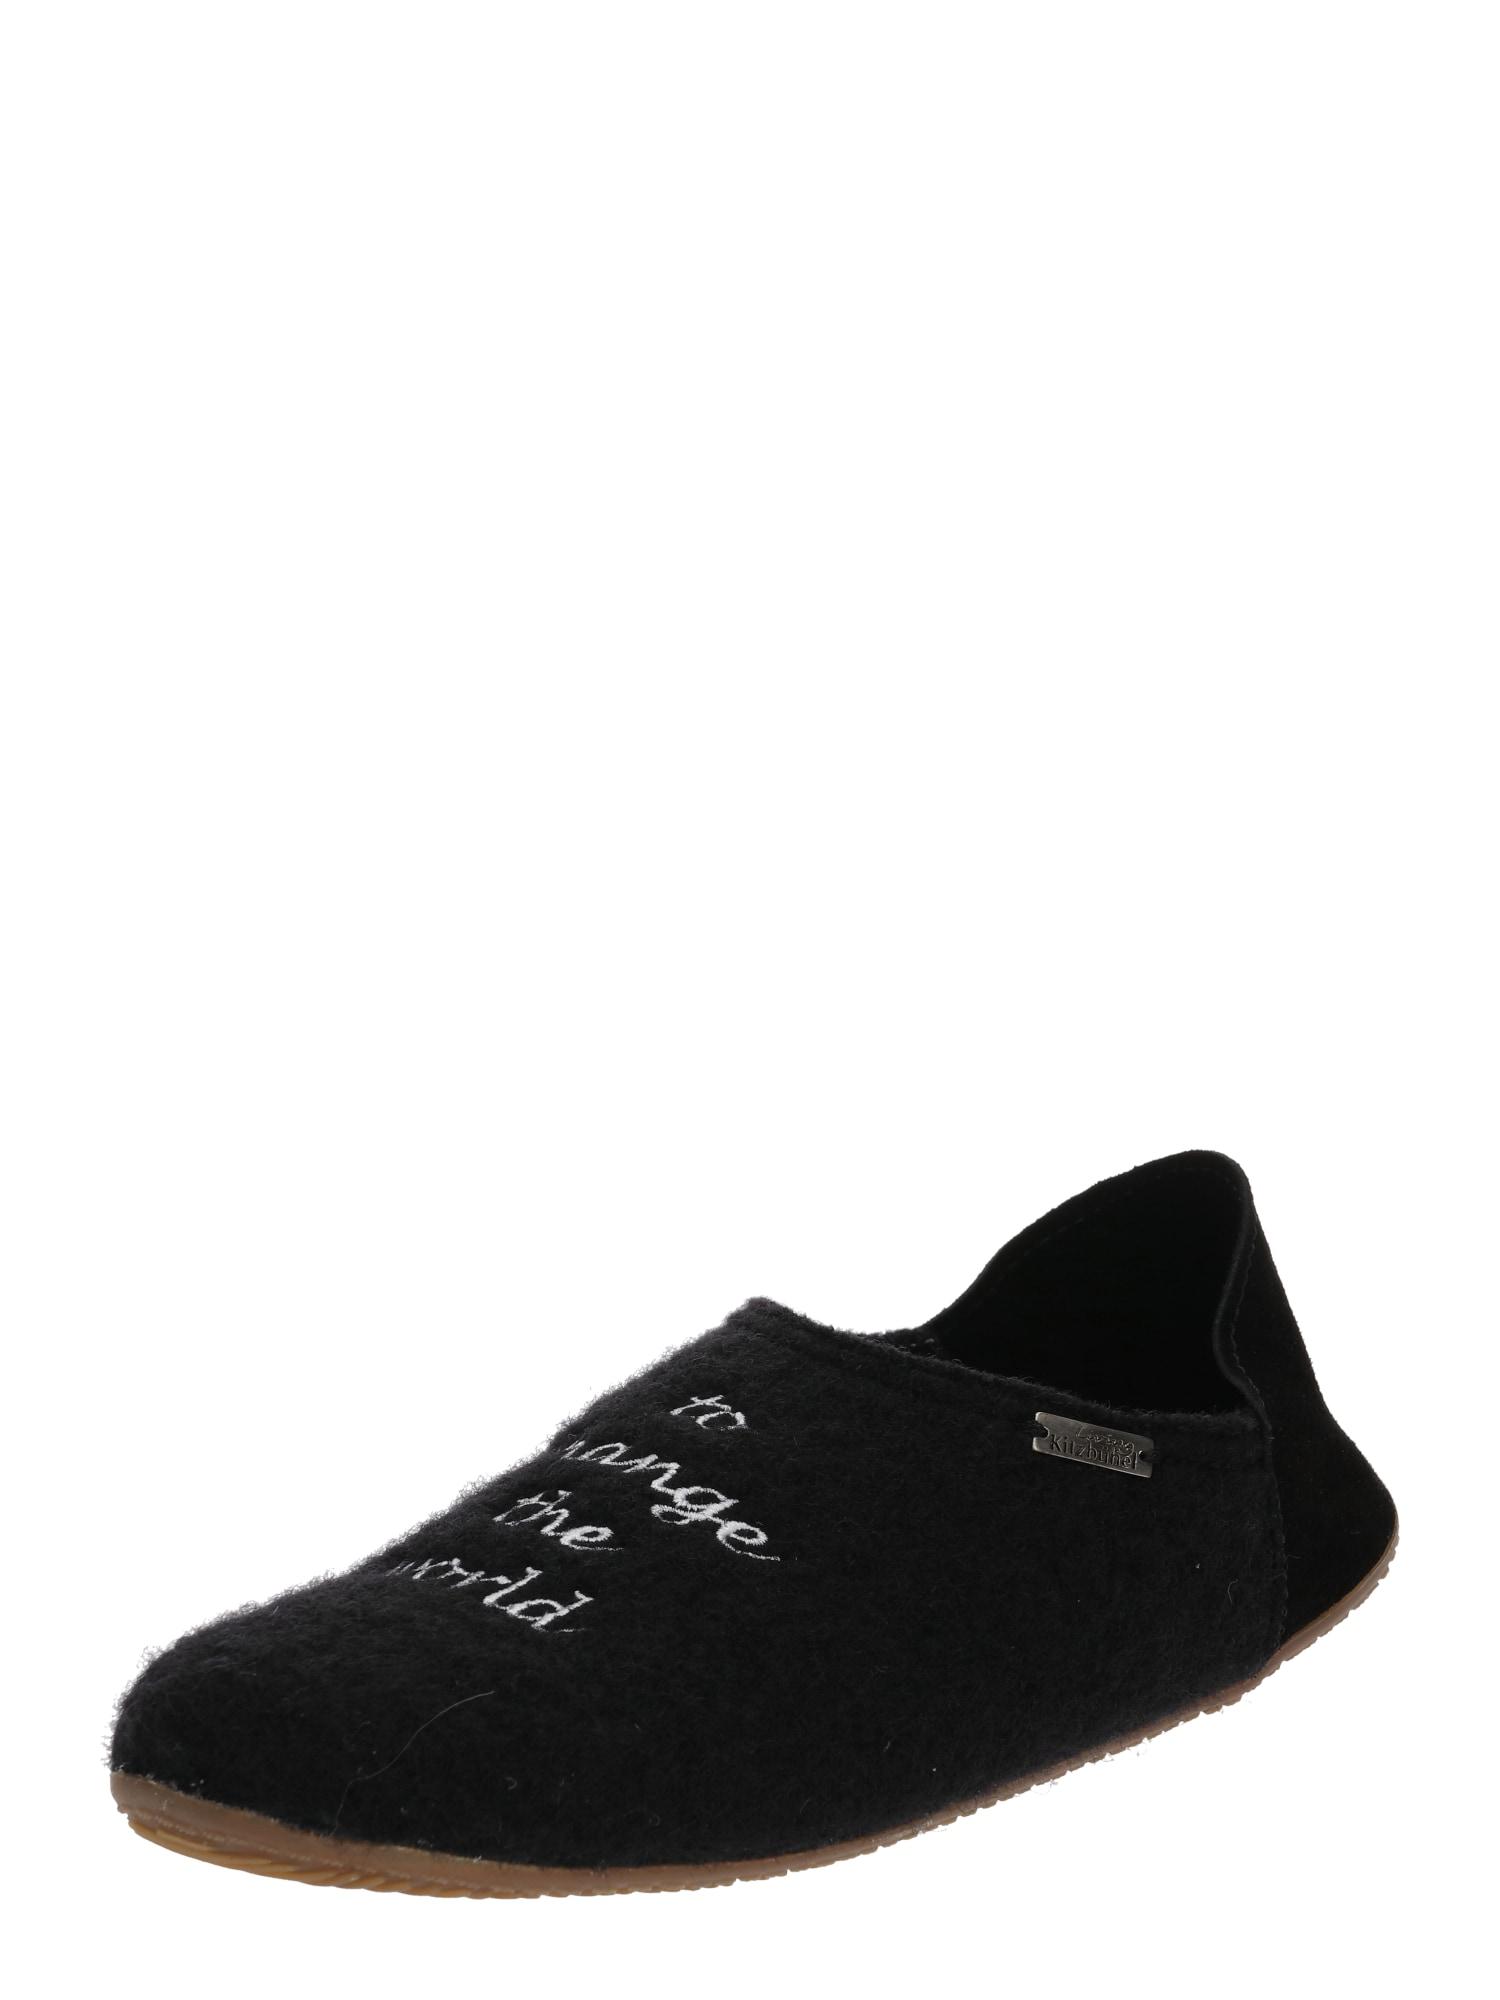 Pantofle 3643-900 černá Living Kitzbühel